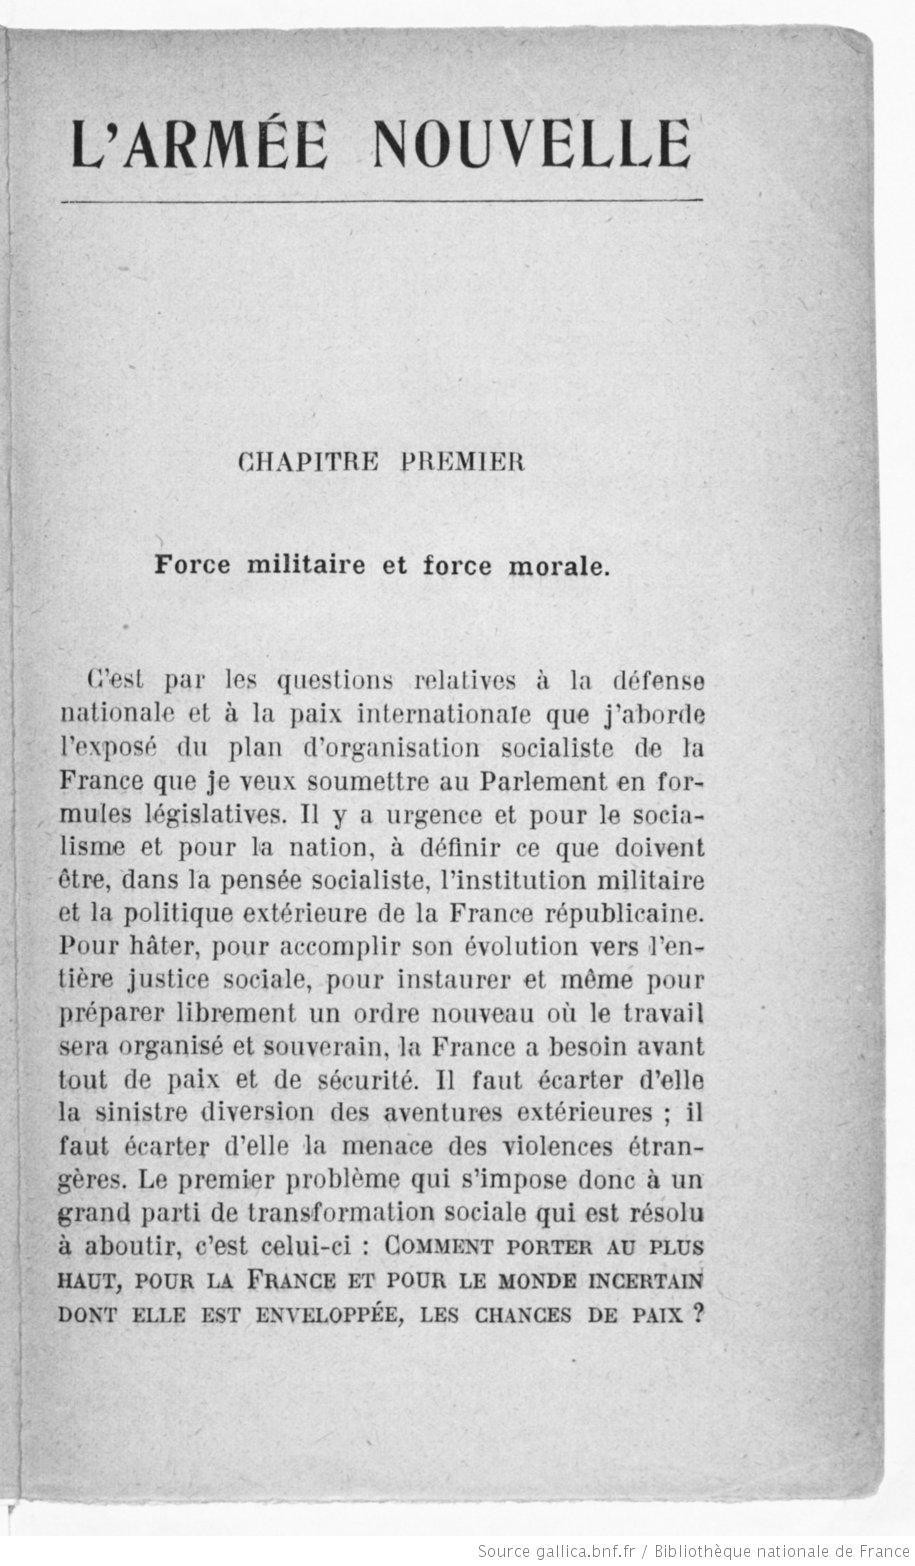 Armee-nouvelle-1911-p1